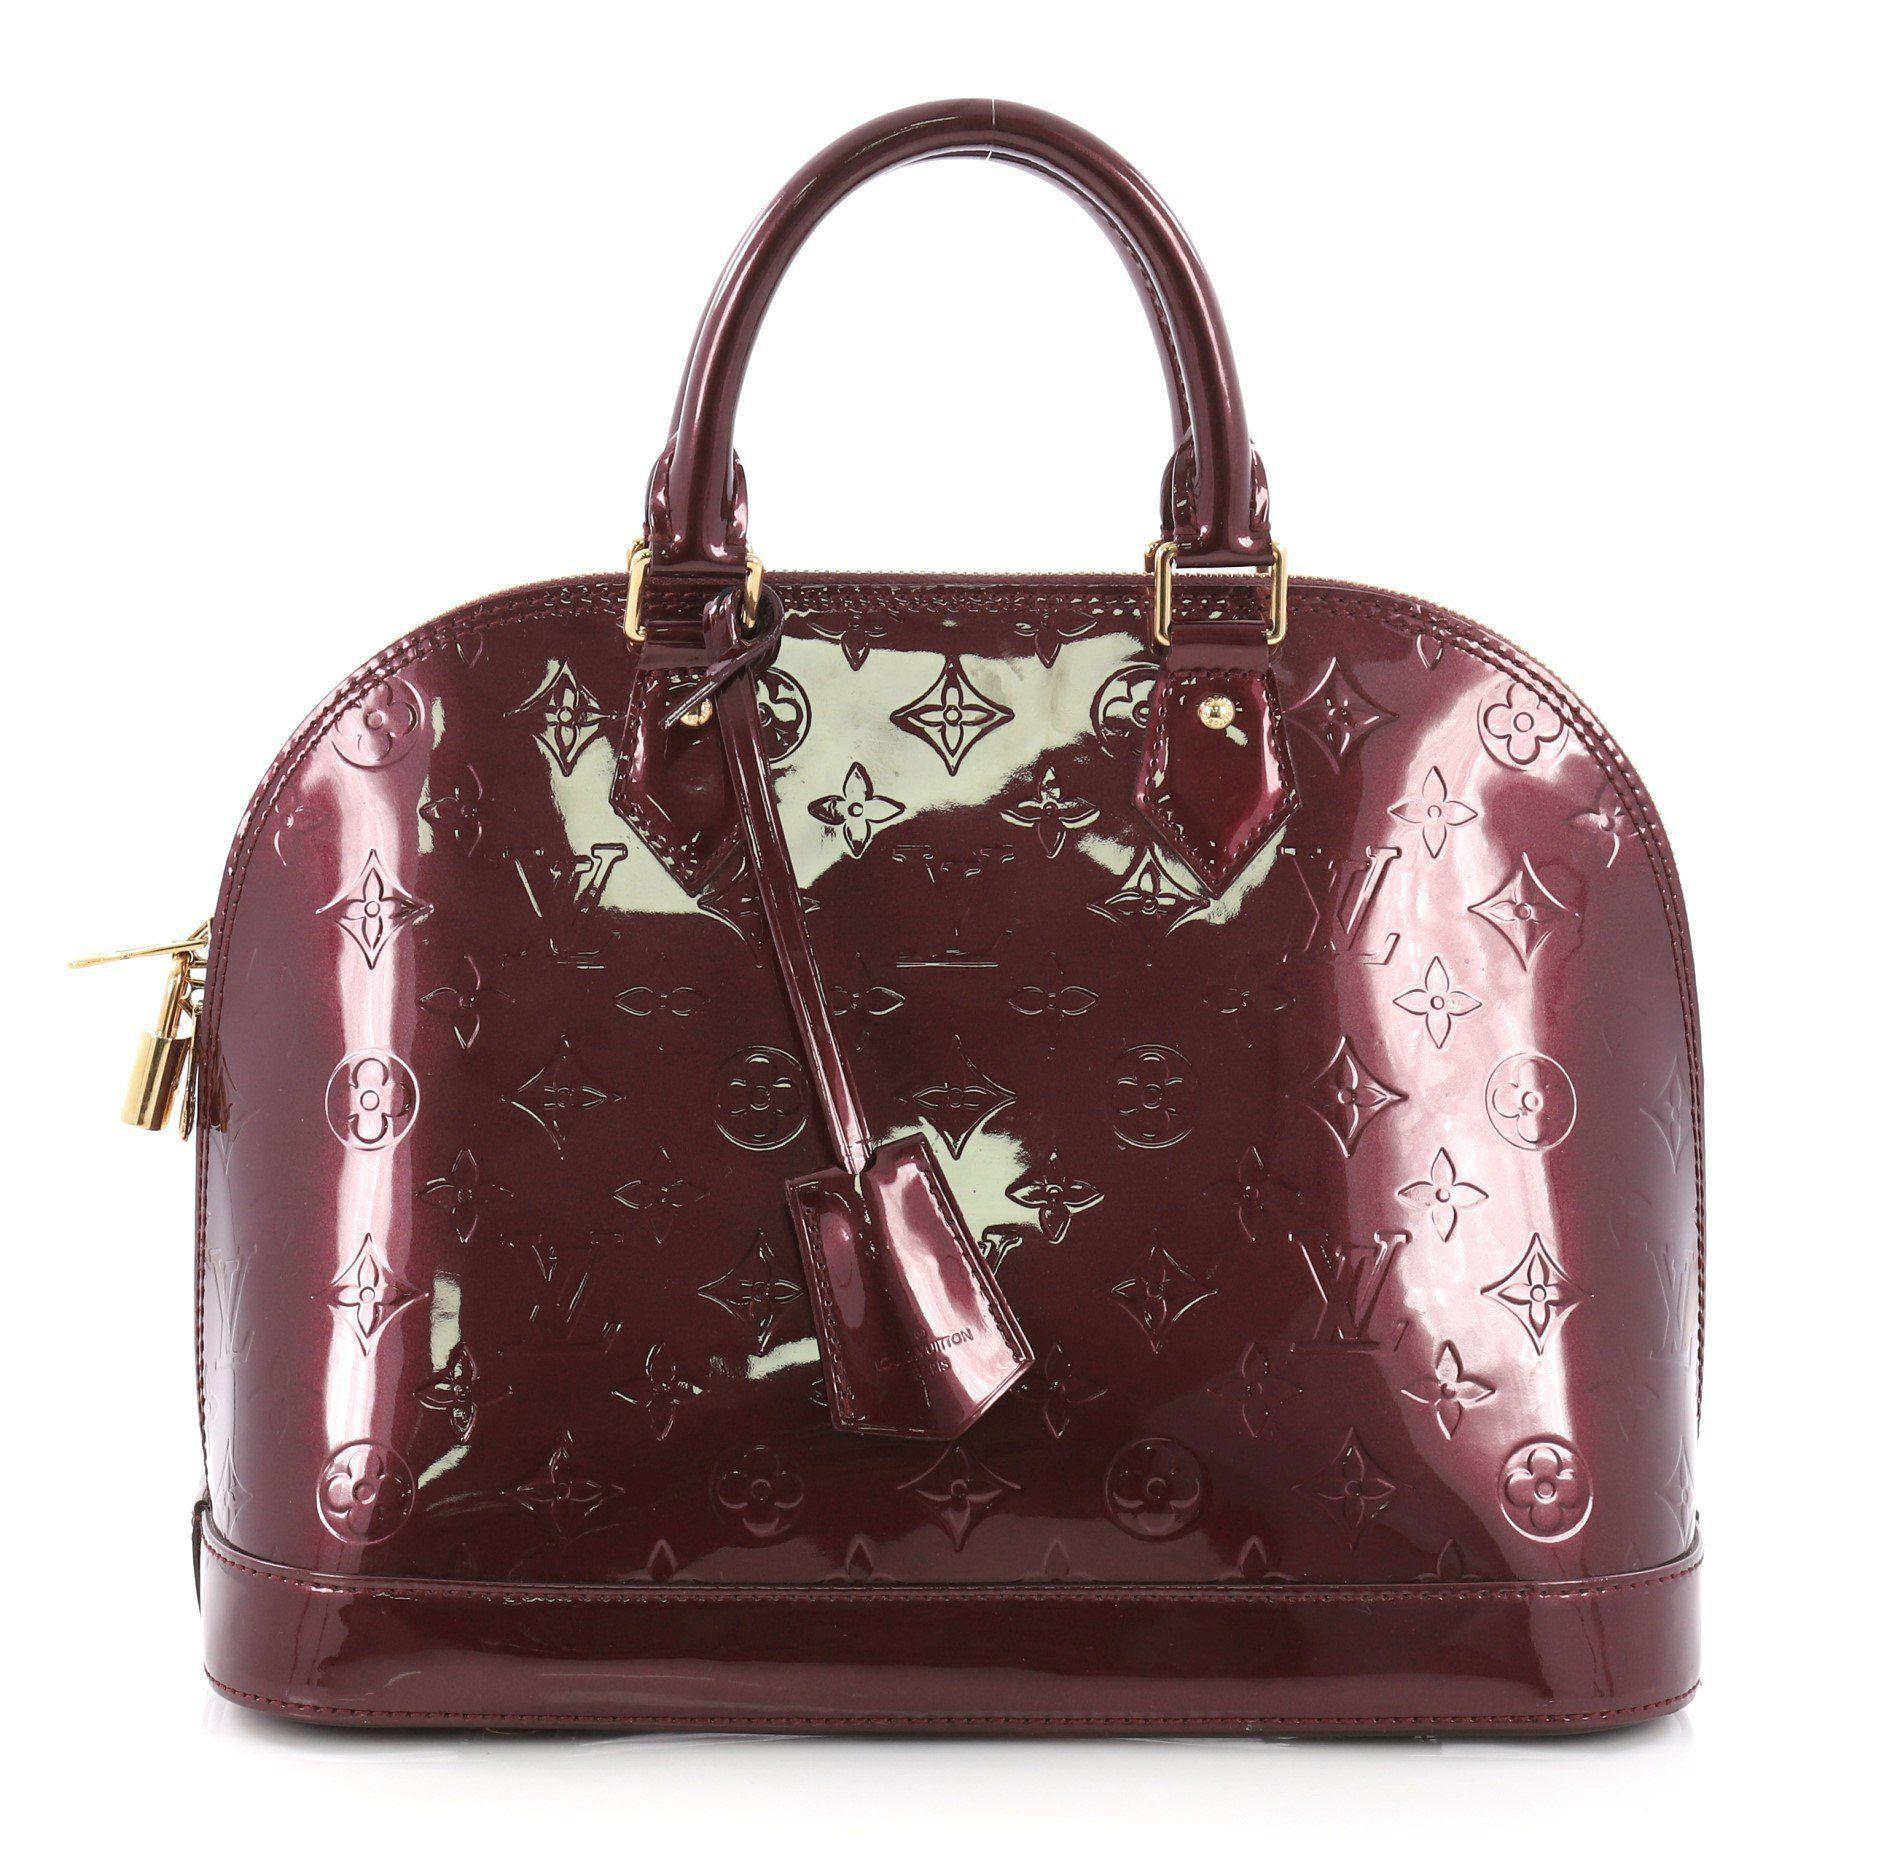 caf1fe160692 Louis Vuitton. Women s Pre Owned Alma Handbag Monogram Vernis Pm